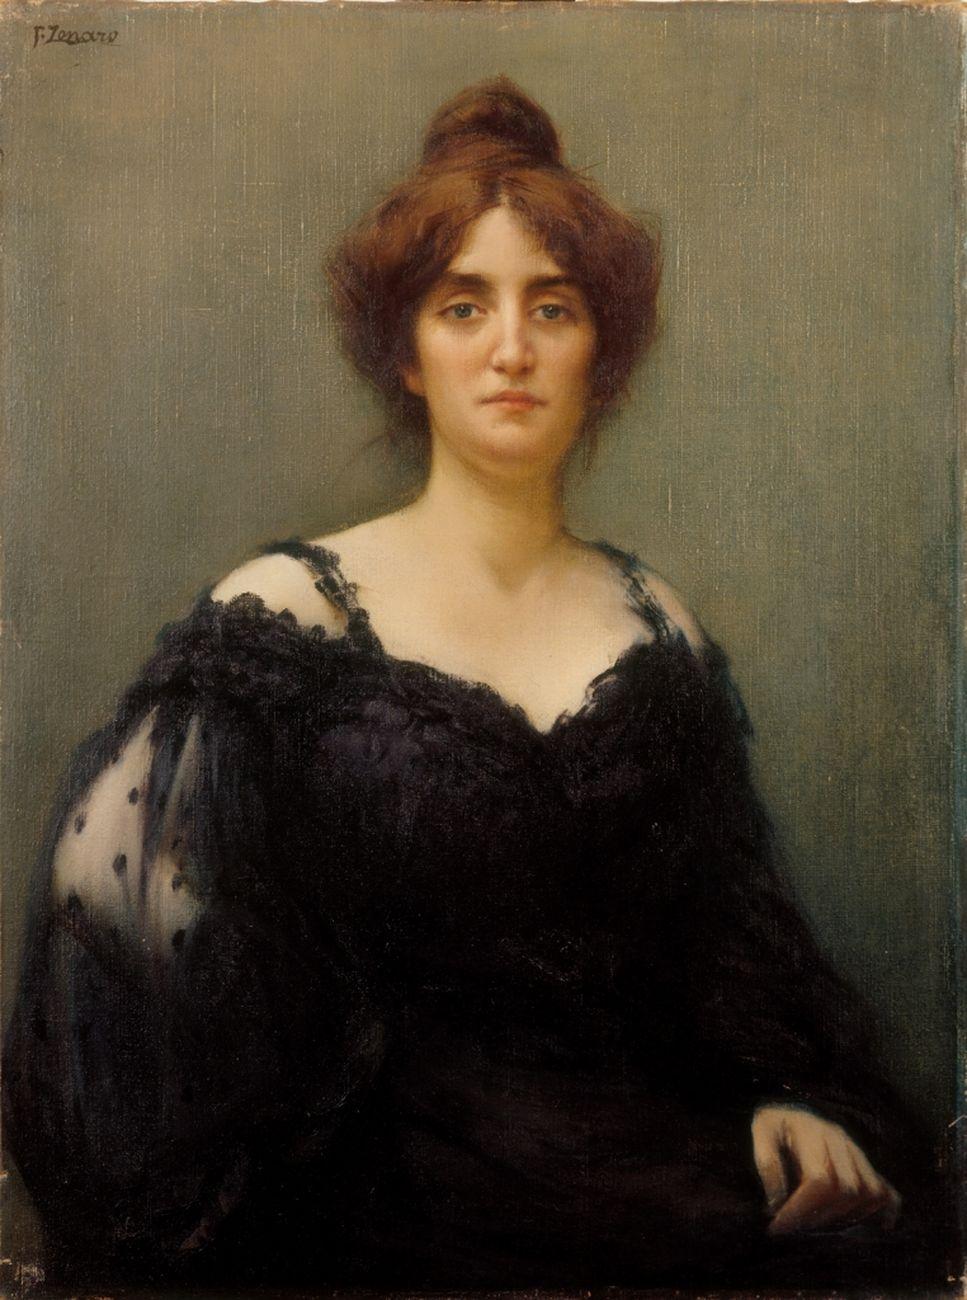 Fausto Zonaro, Mia moglie Elisa, 1904. Eredi Zonaro, Firenze